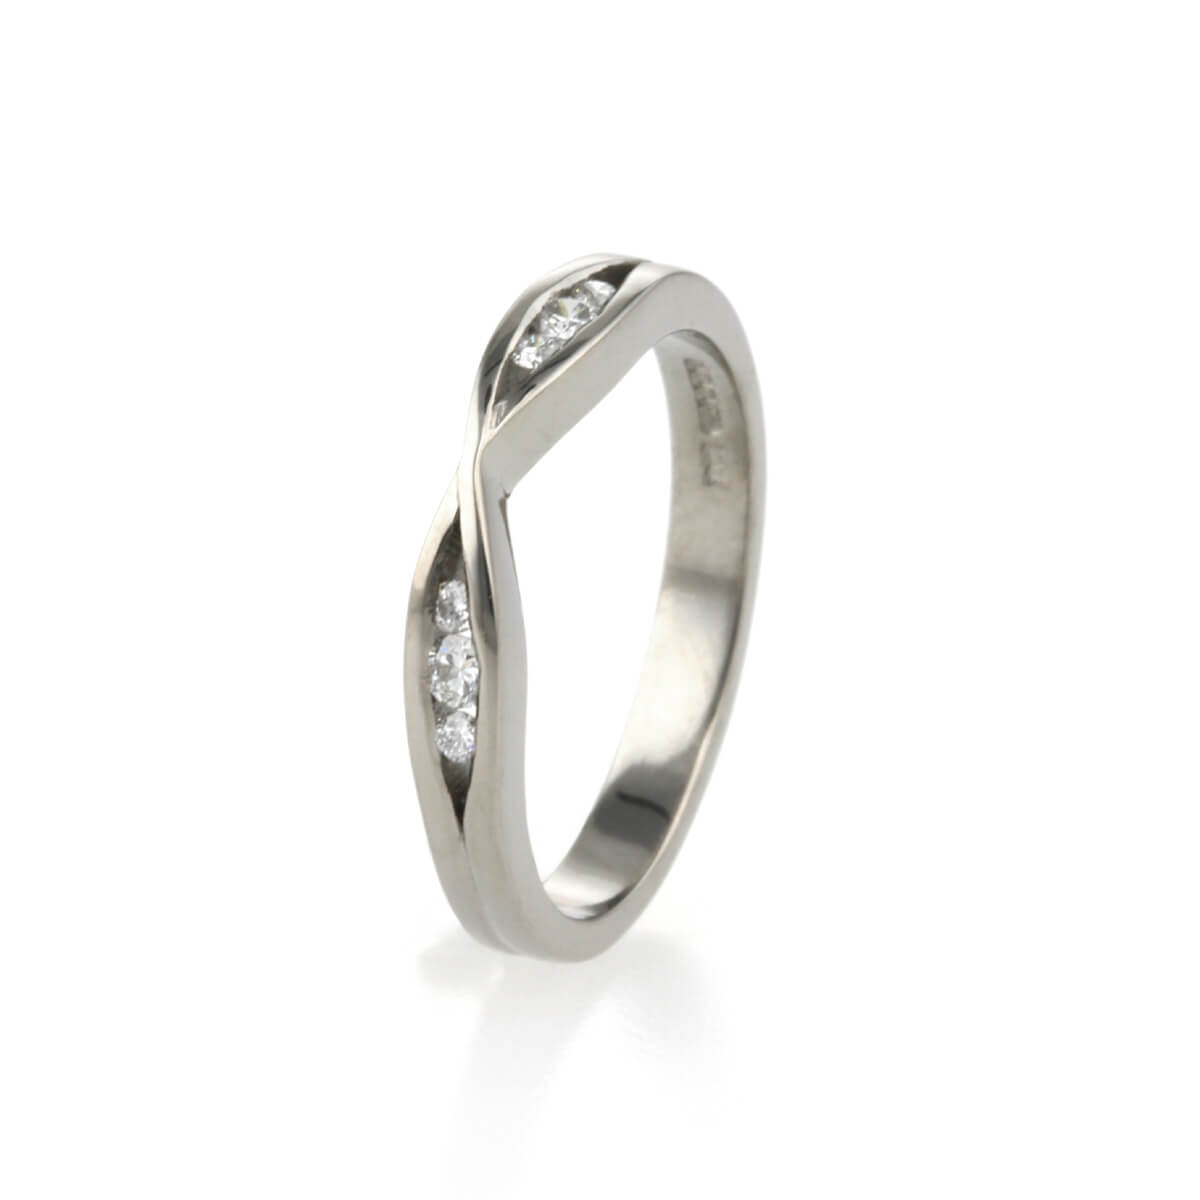 18ct-ladies-w-diamond-infinity-inspired-wedding-ring-2